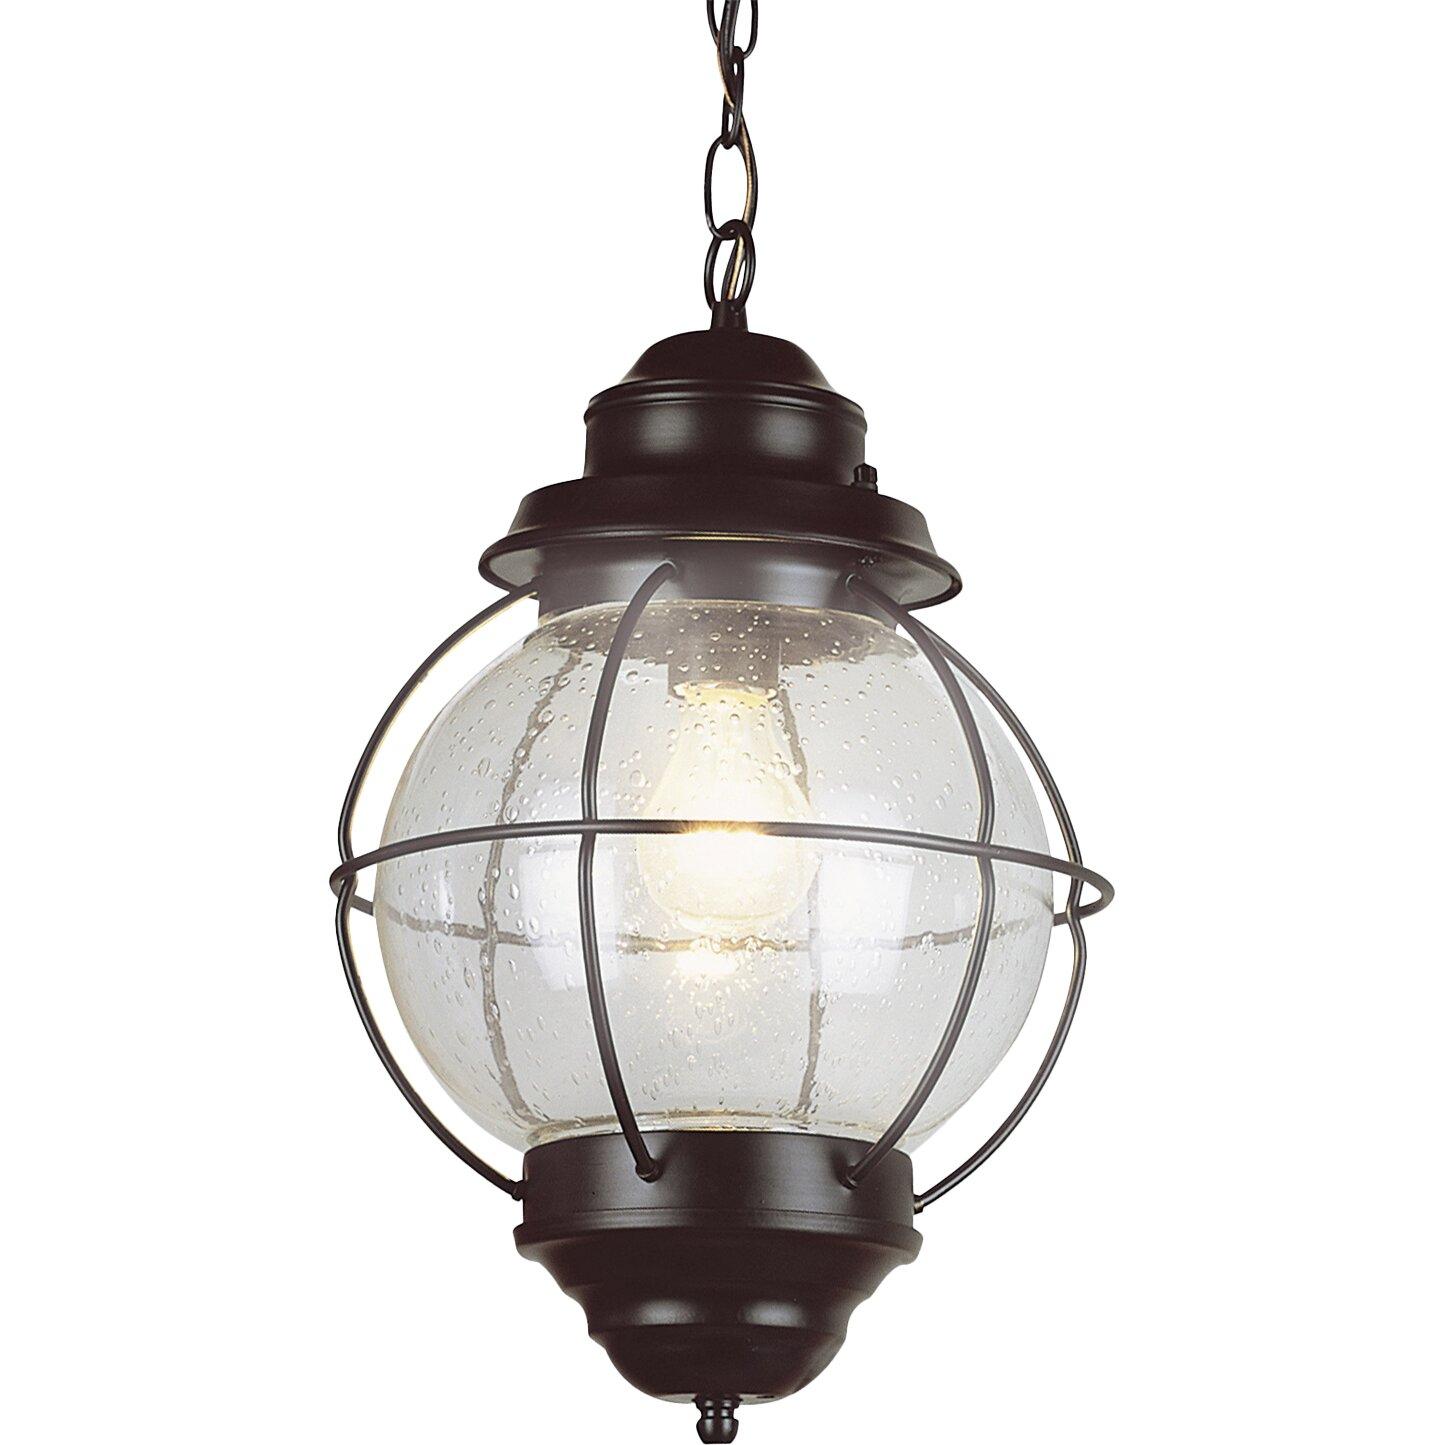 Outdoor Hanging Solar Lights Canada: Beachcrest Home Ravenwood 1-Light Outdoor Hanging Lantern